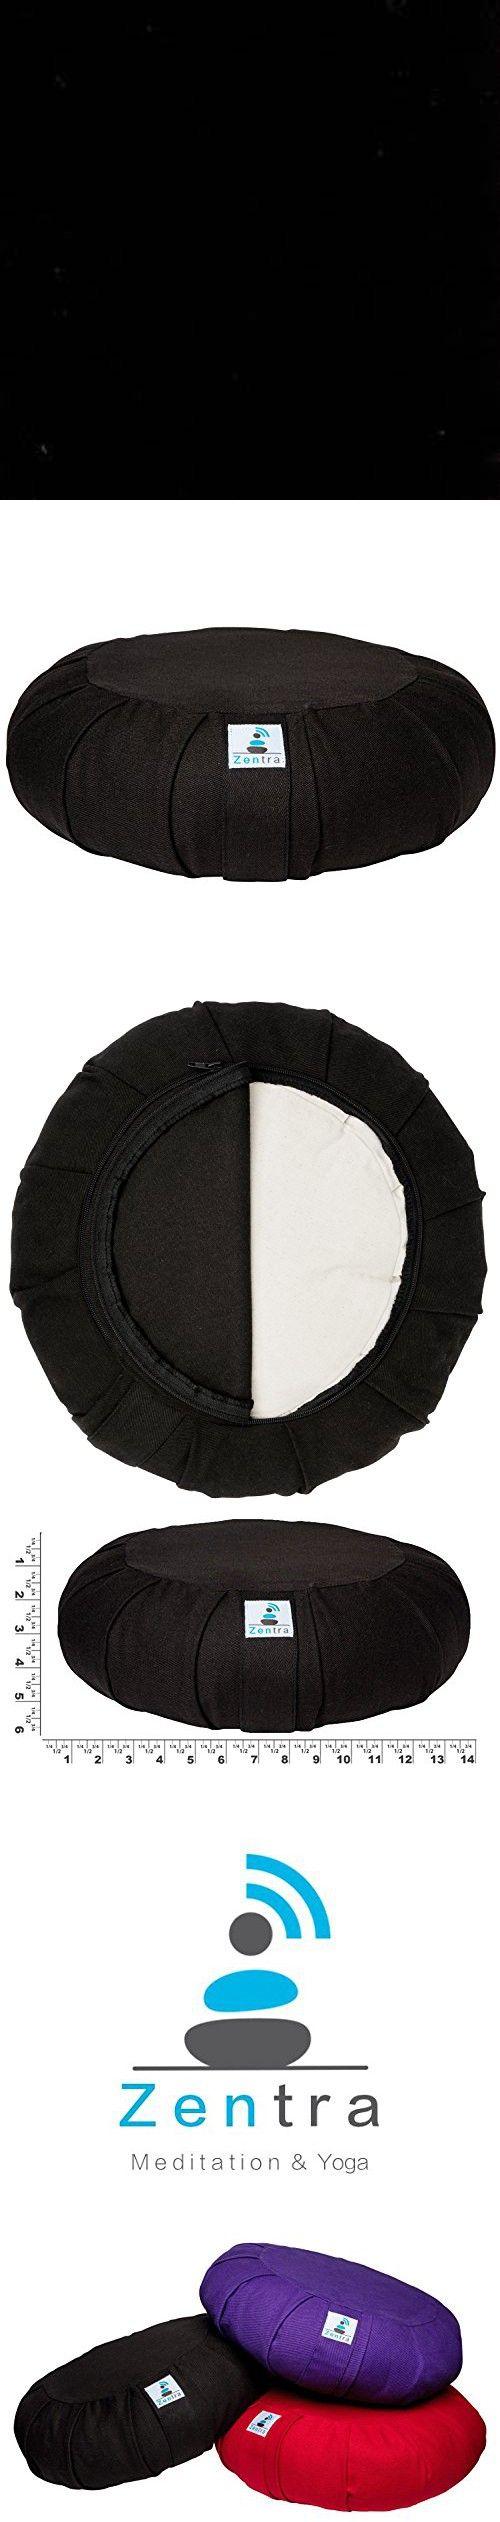 Zentra Zafu Yoga Meditation Cushion Cotton Fill Pleated (Black)